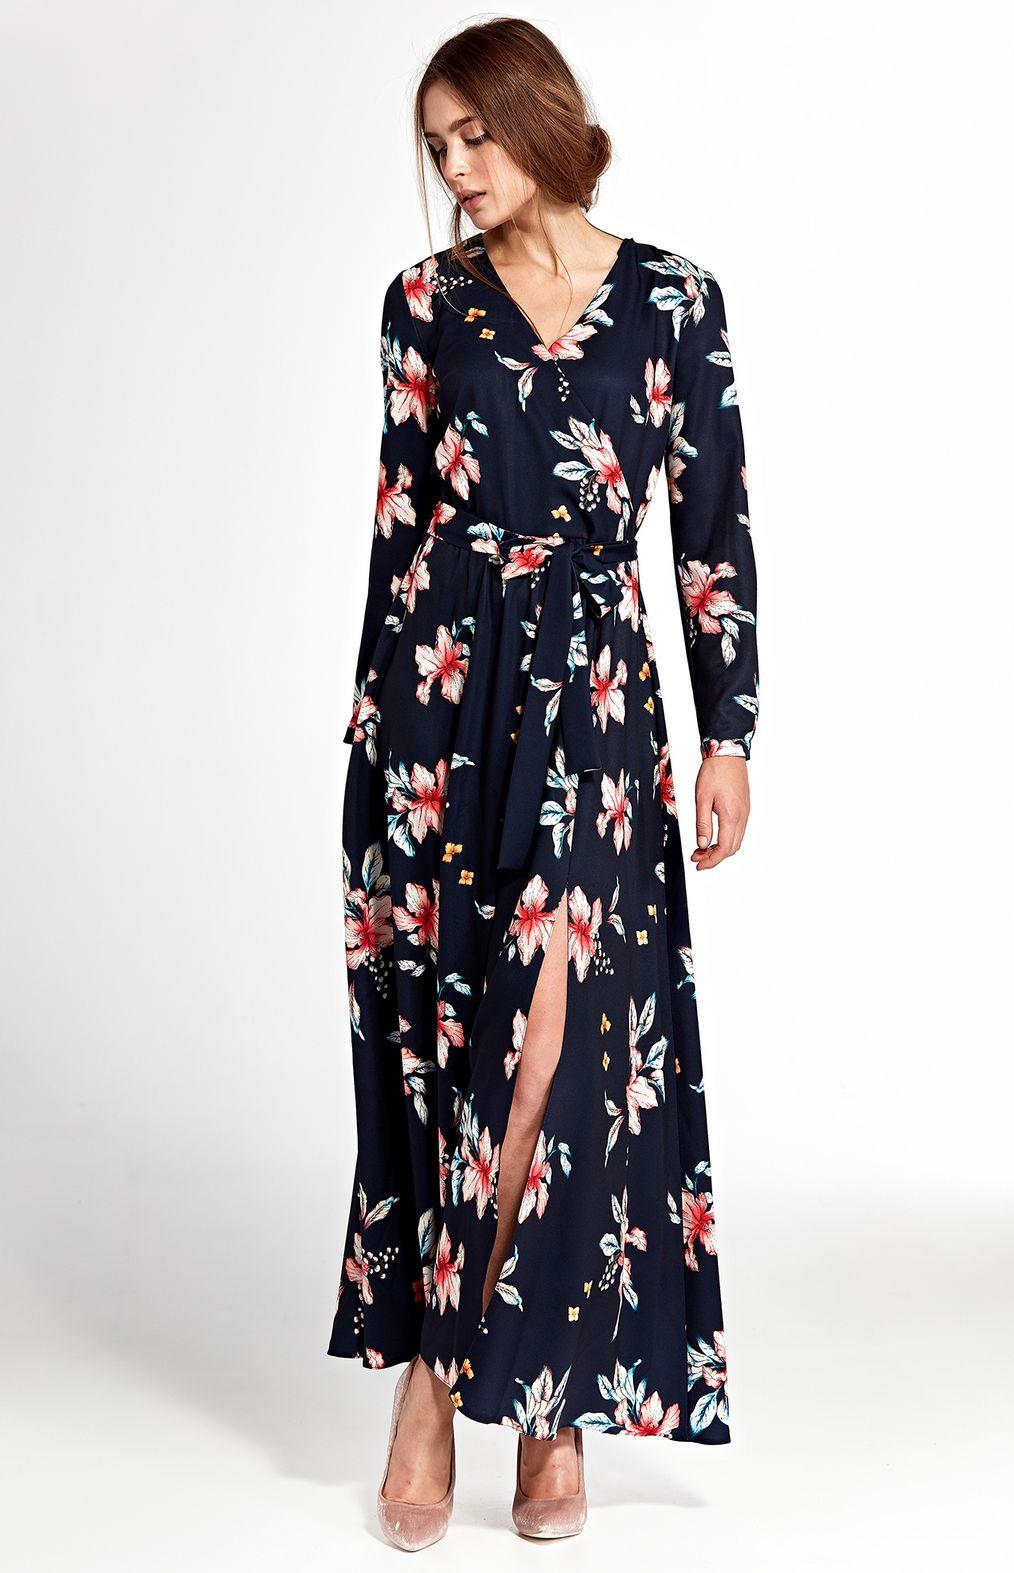 Robe longue noir fleurs bleu